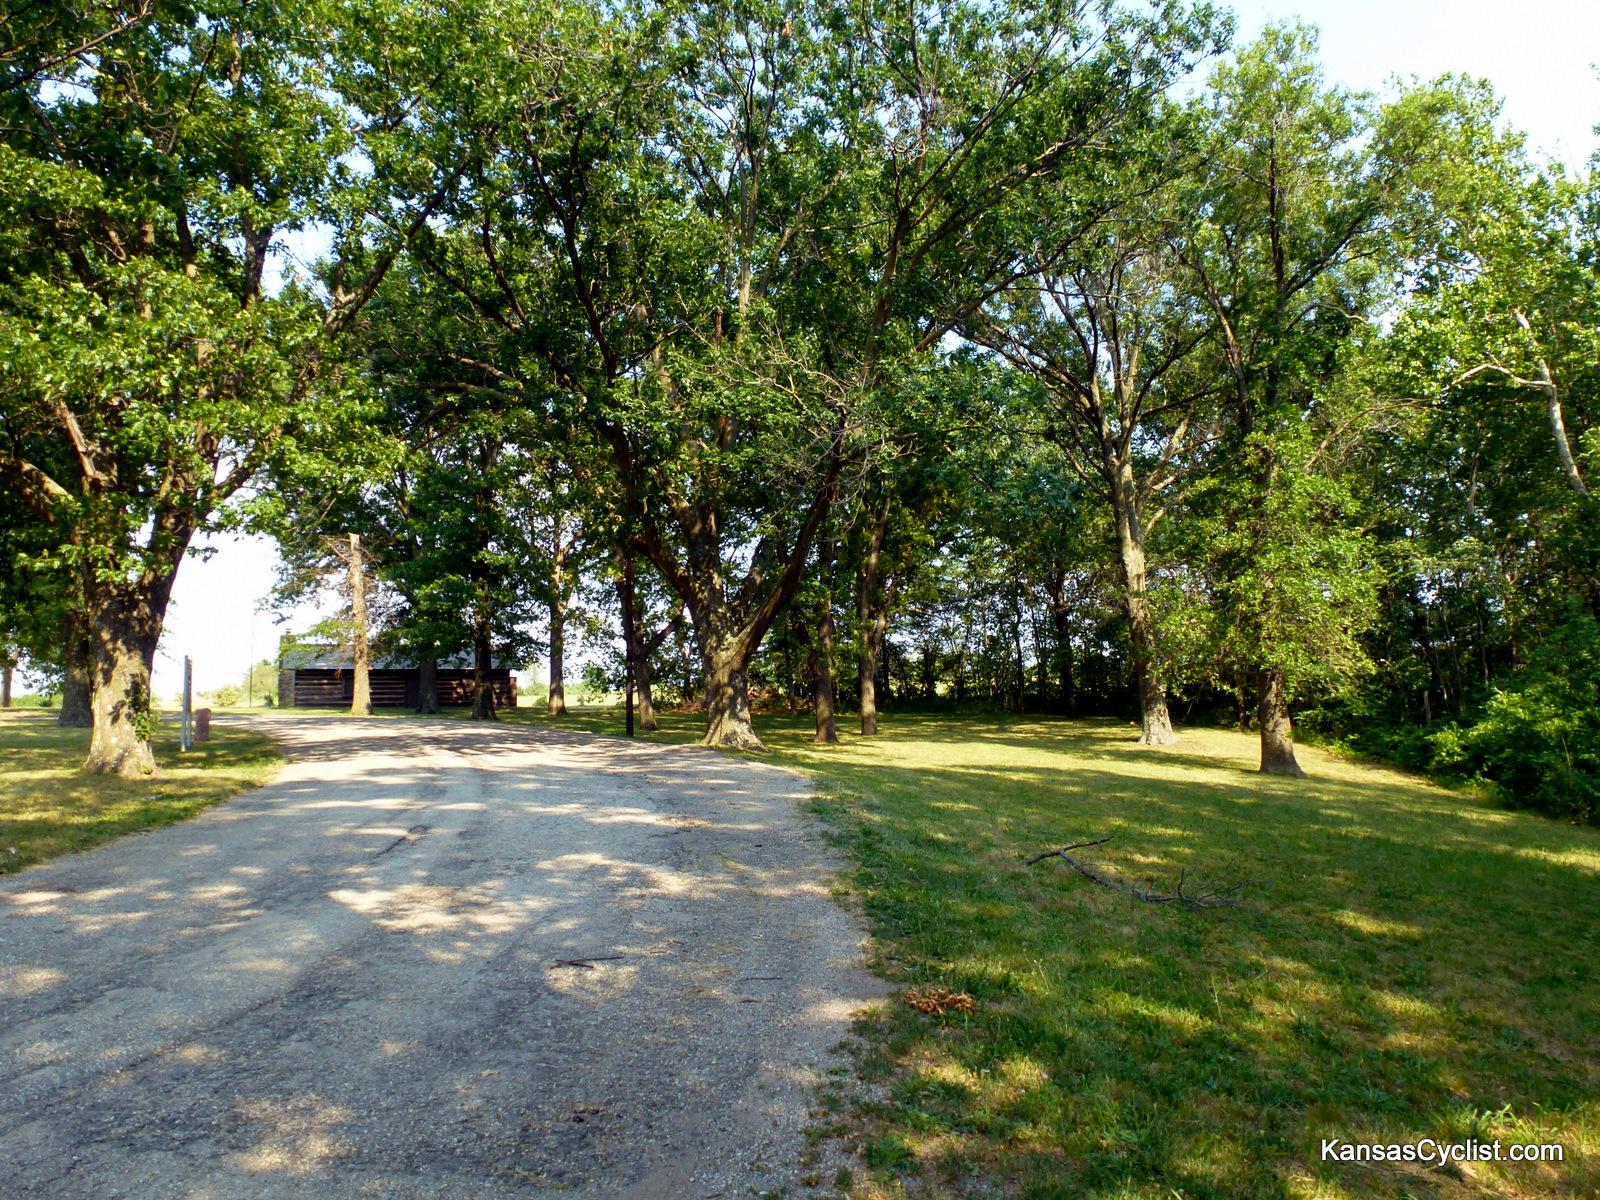 Us 56 Baldwin City Roadside Park Kansas Cyclist Photo